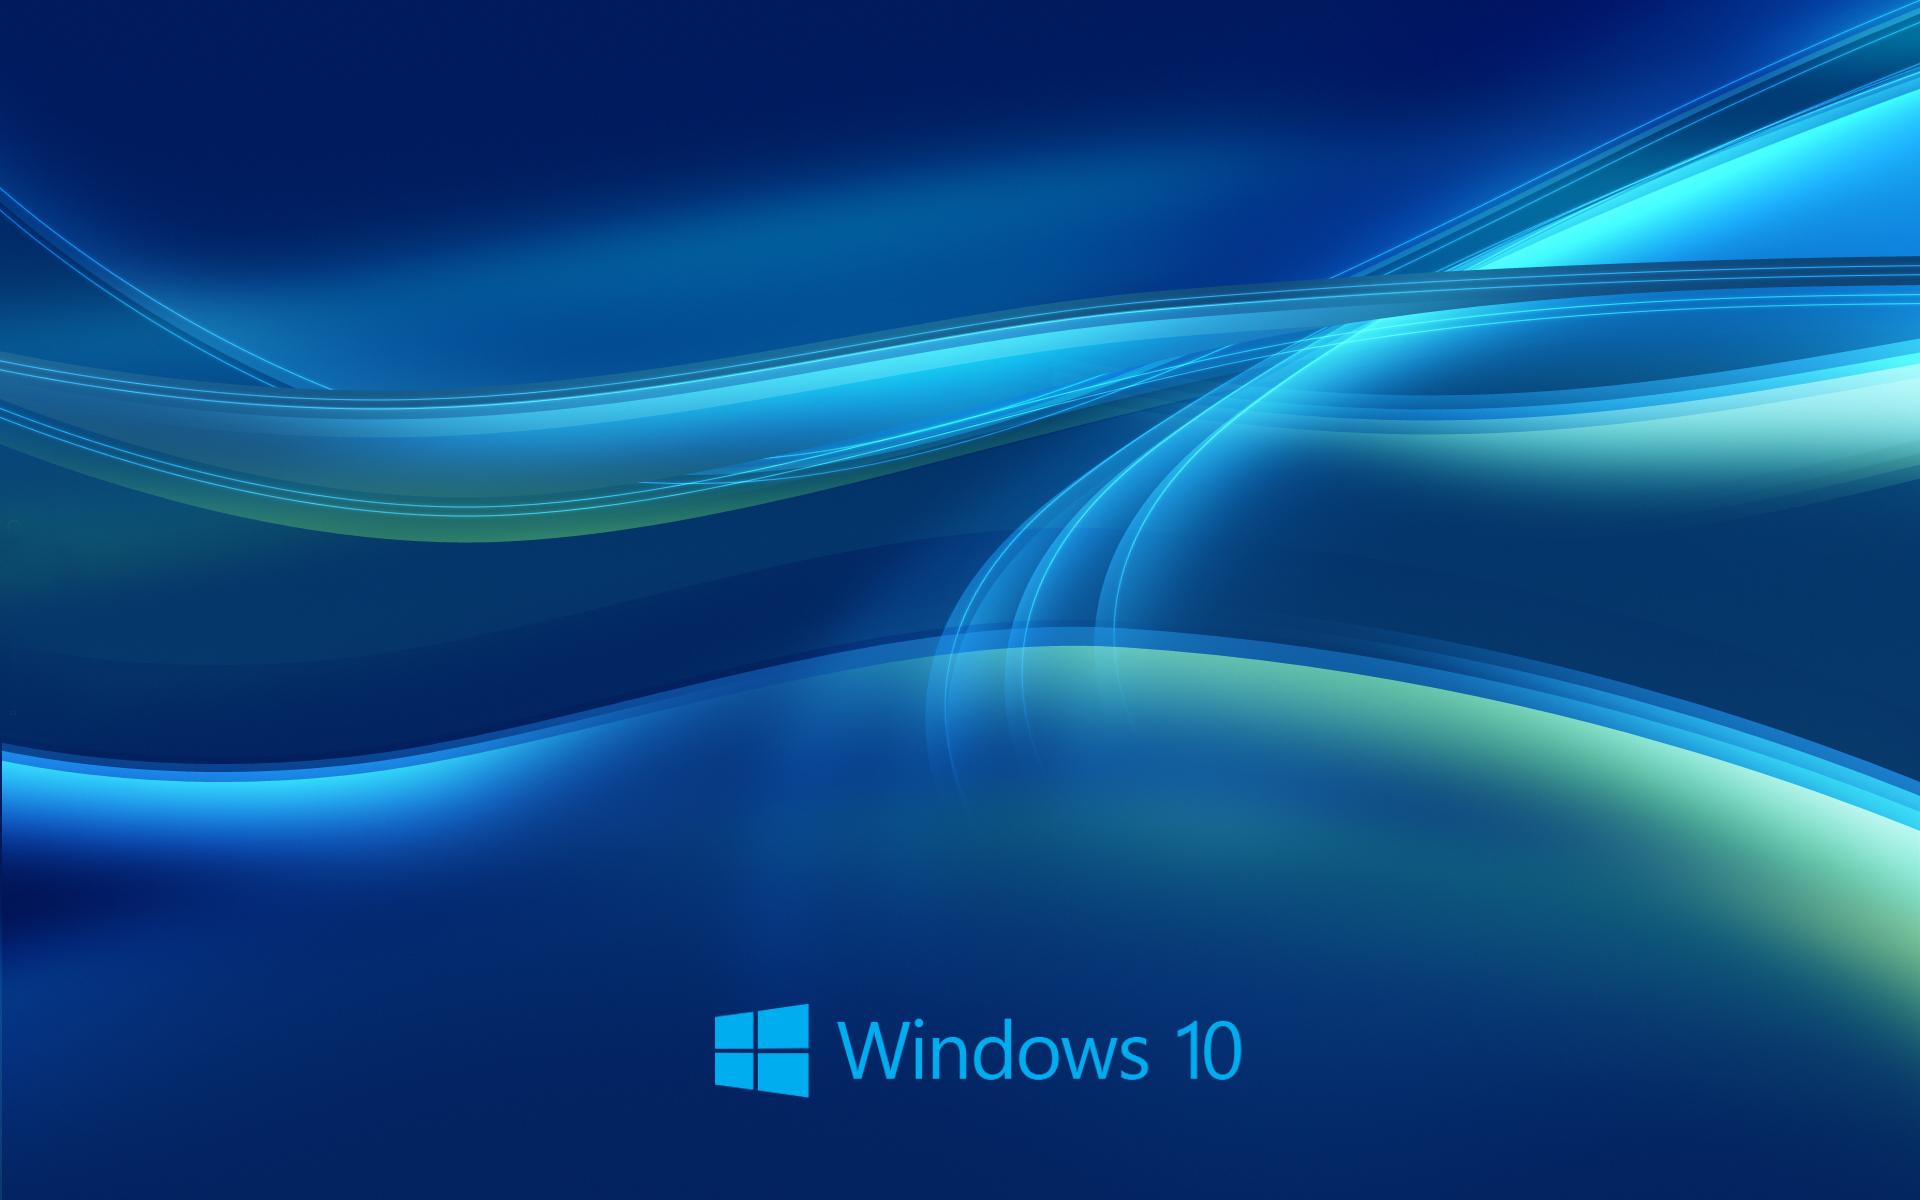 Windows 10 Wallpapers 10 1920x1200